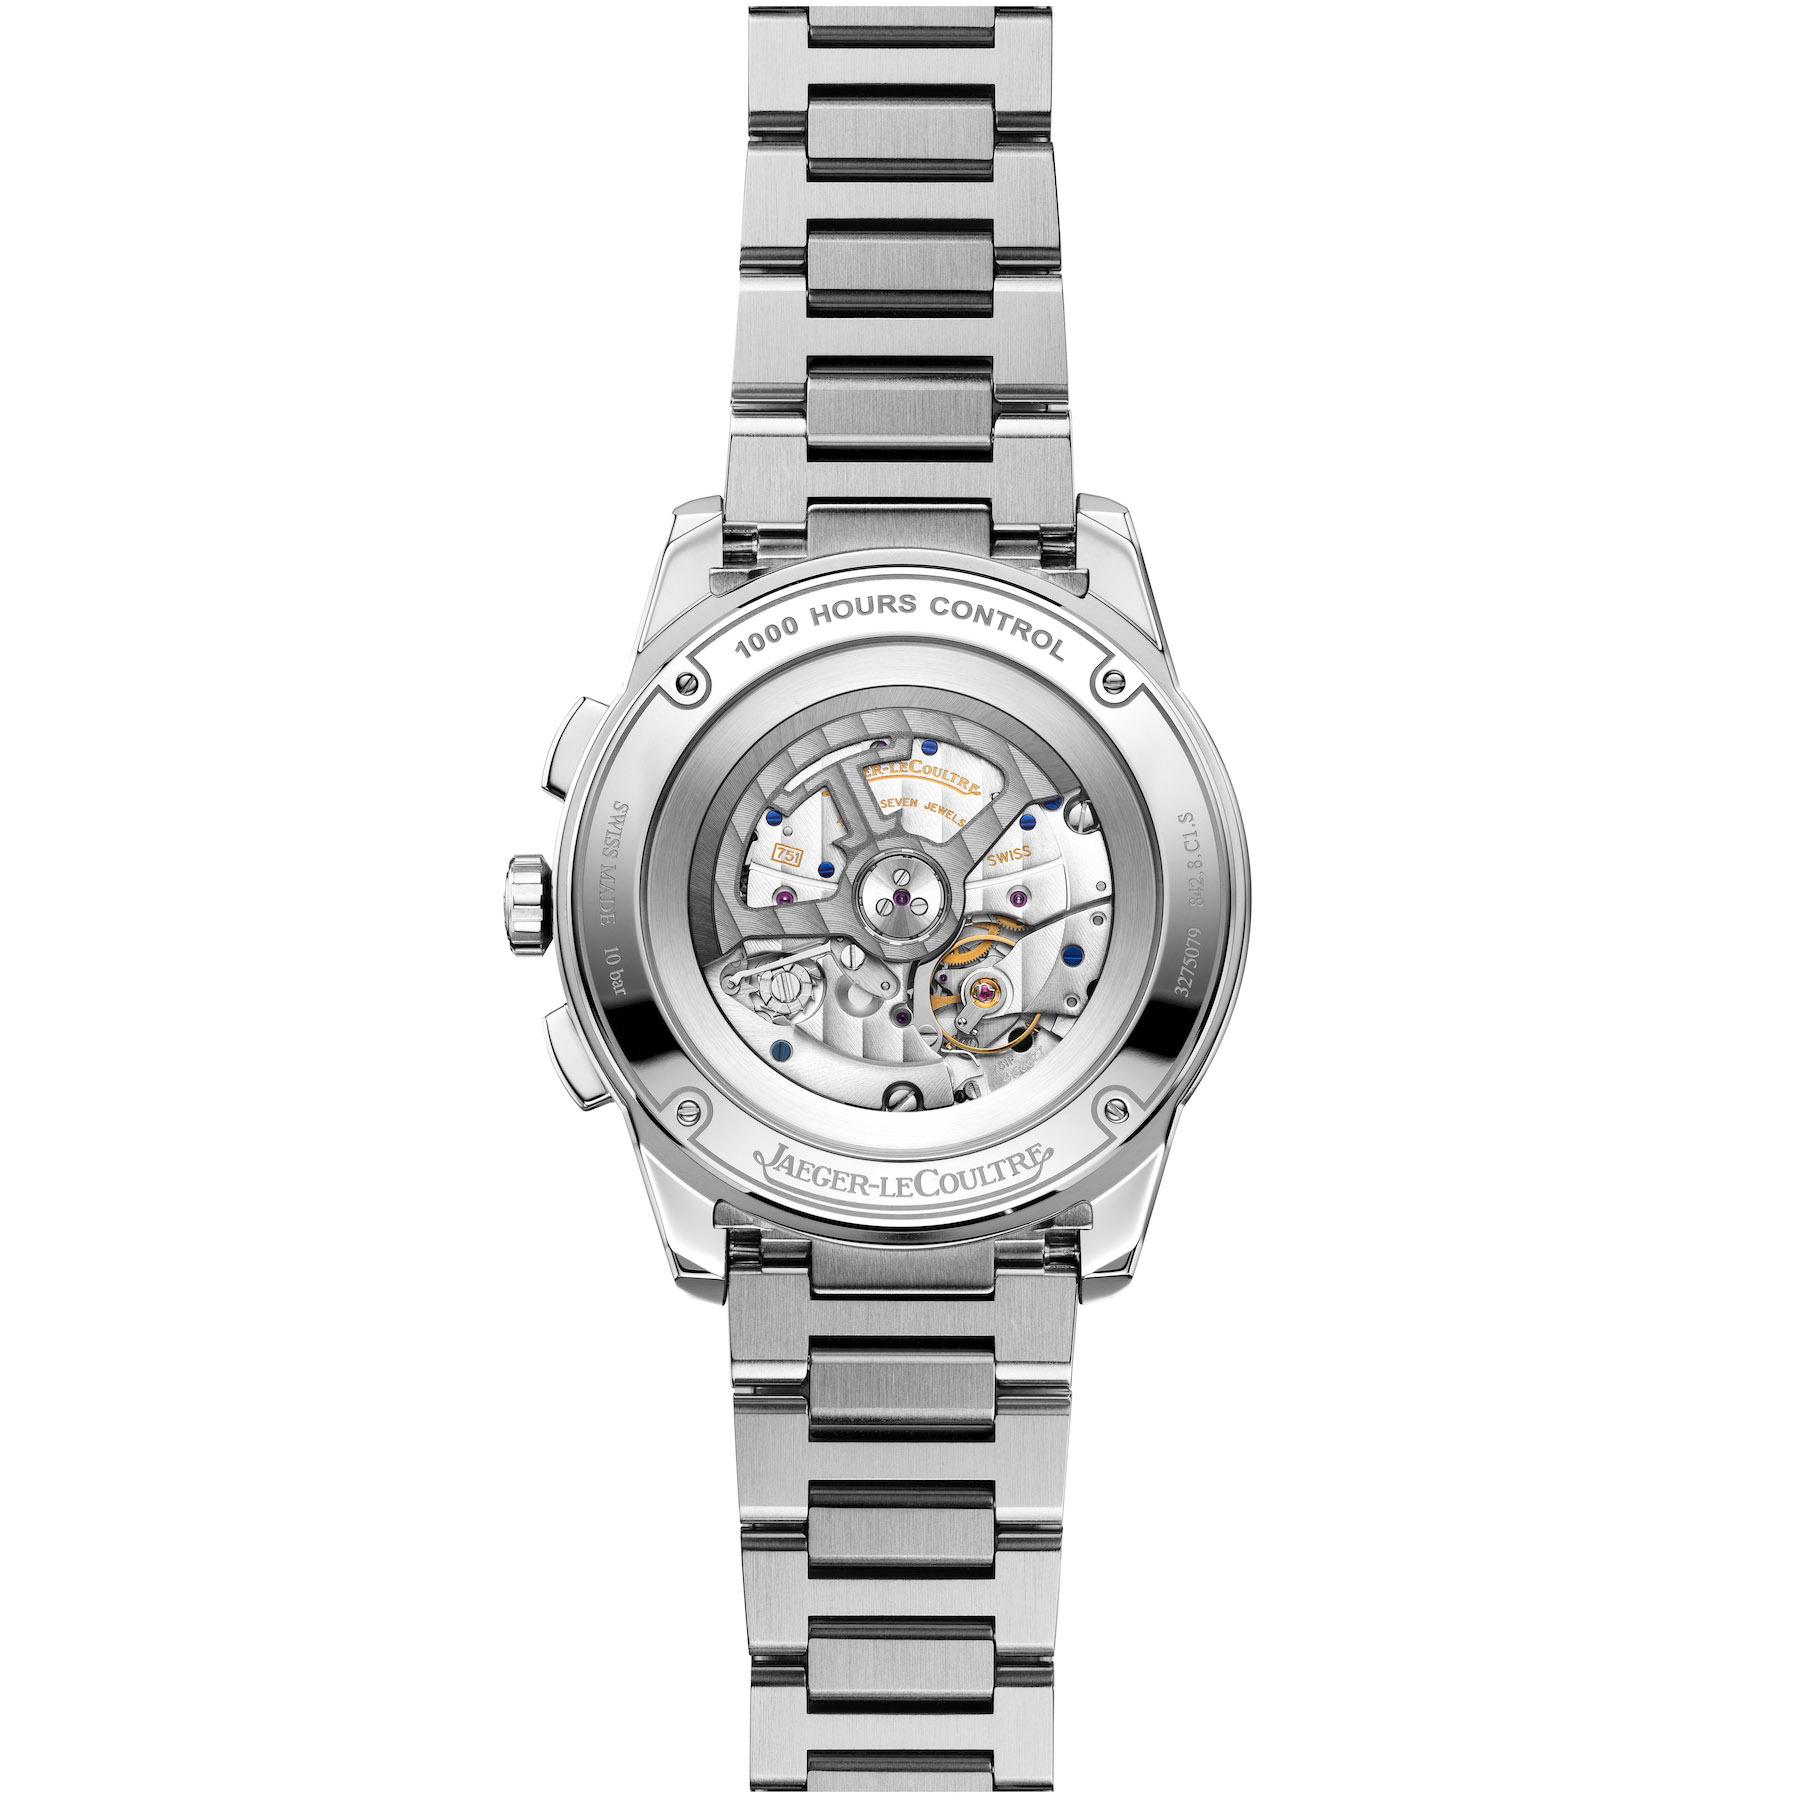 Die neue Jaeger-LeCoultre Polaris Chronograph